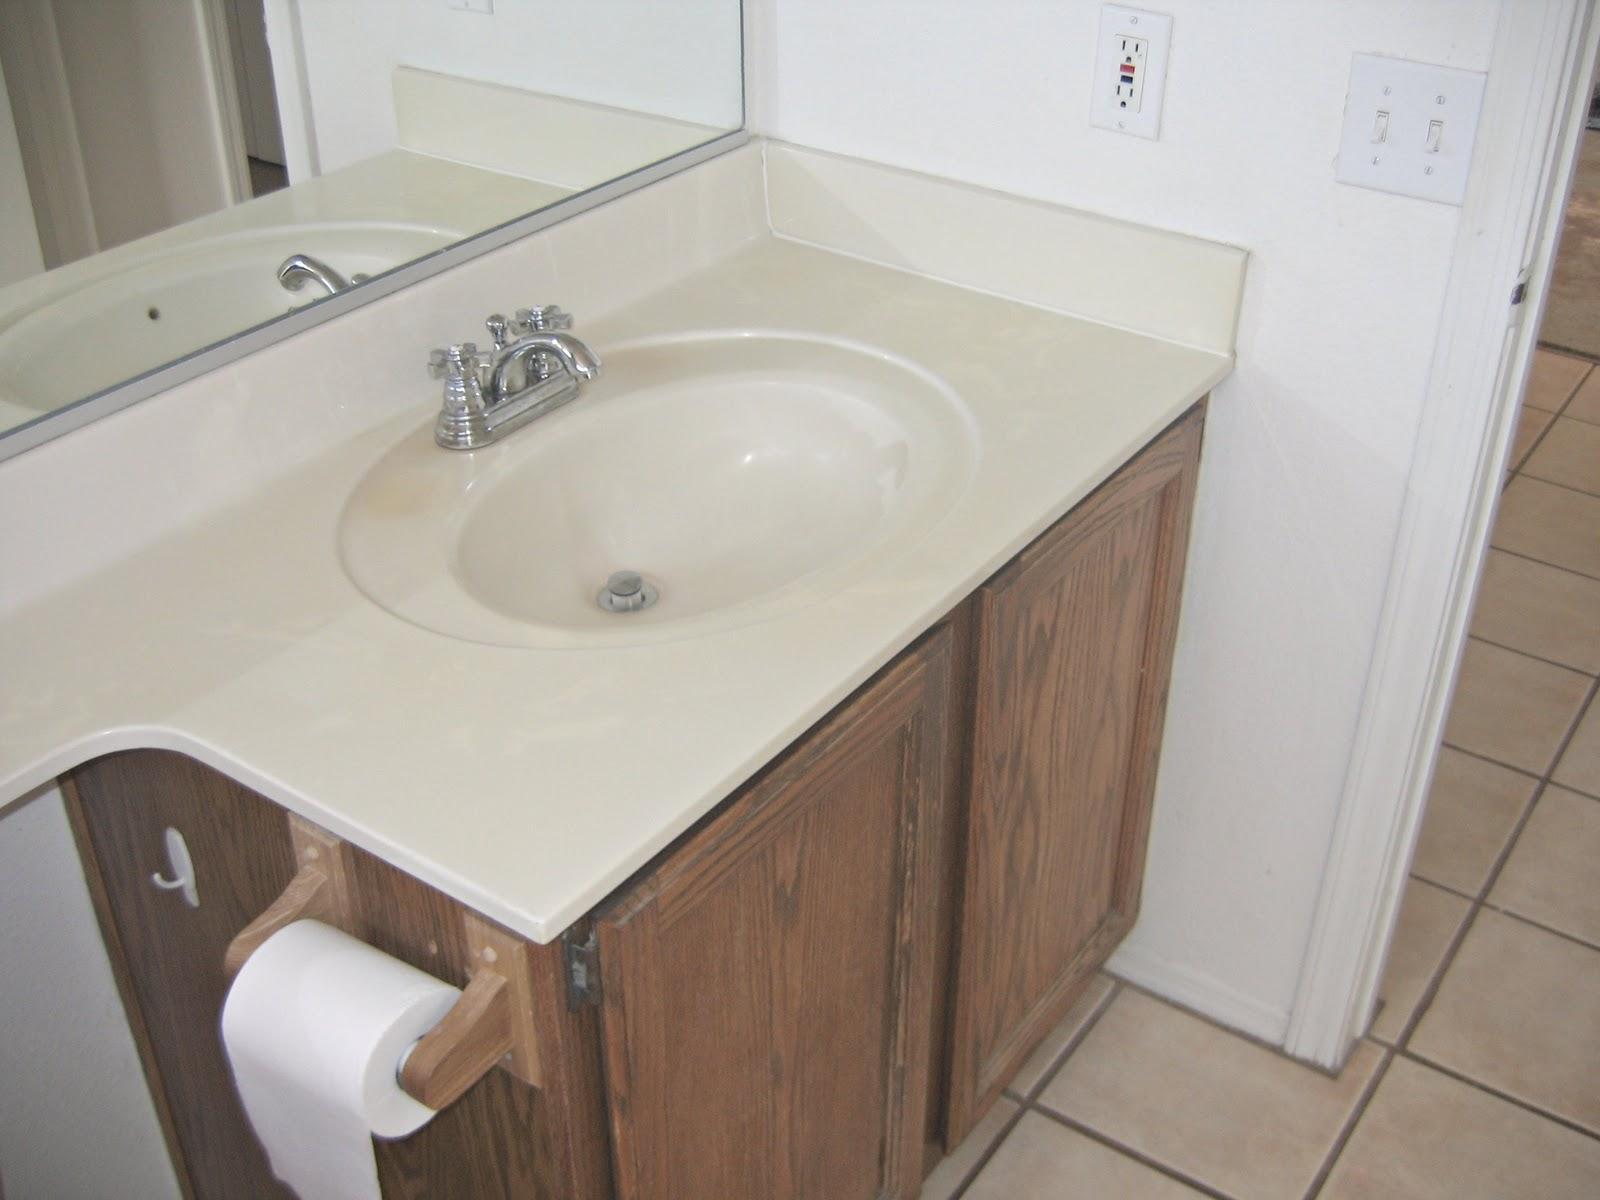 All In One Bathroom Reigna Layn East Coast Inspired Loo